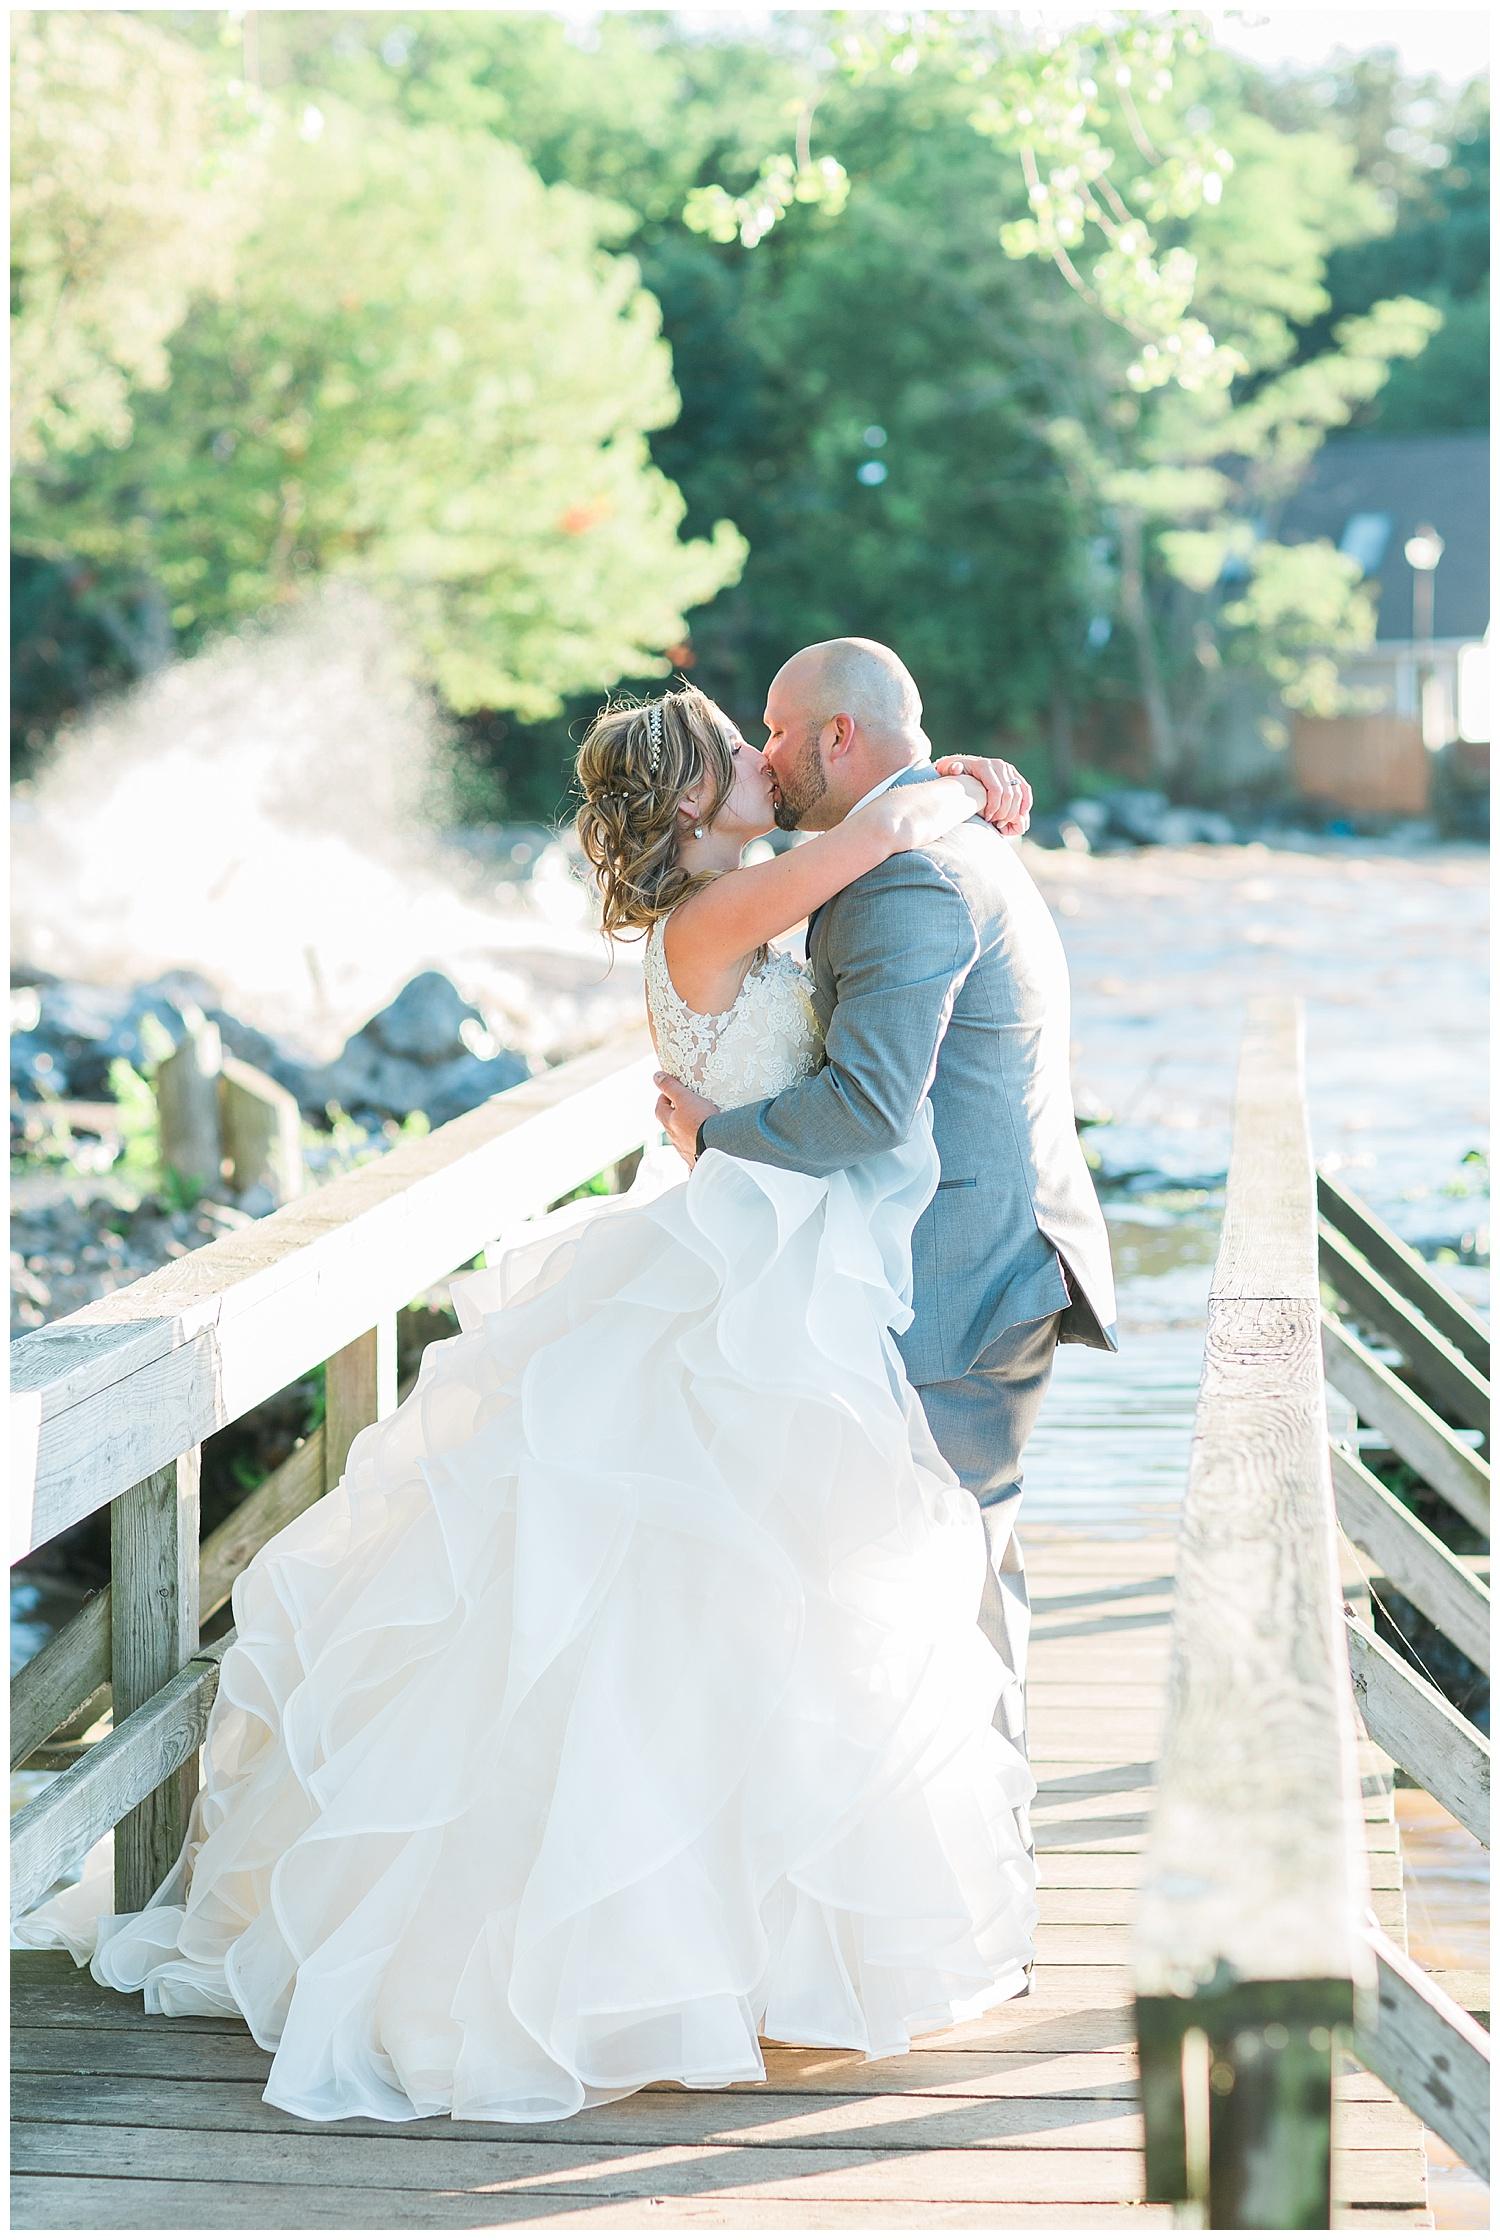 Sean and Andrea - Webster wedding - lass and beau-1115_Buffalo wedding photography.jpg